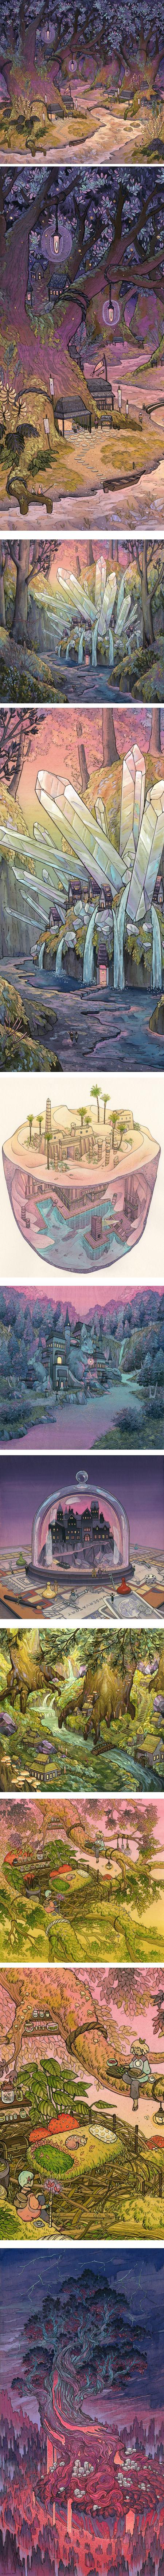 Nicole Gustafsson, illustration